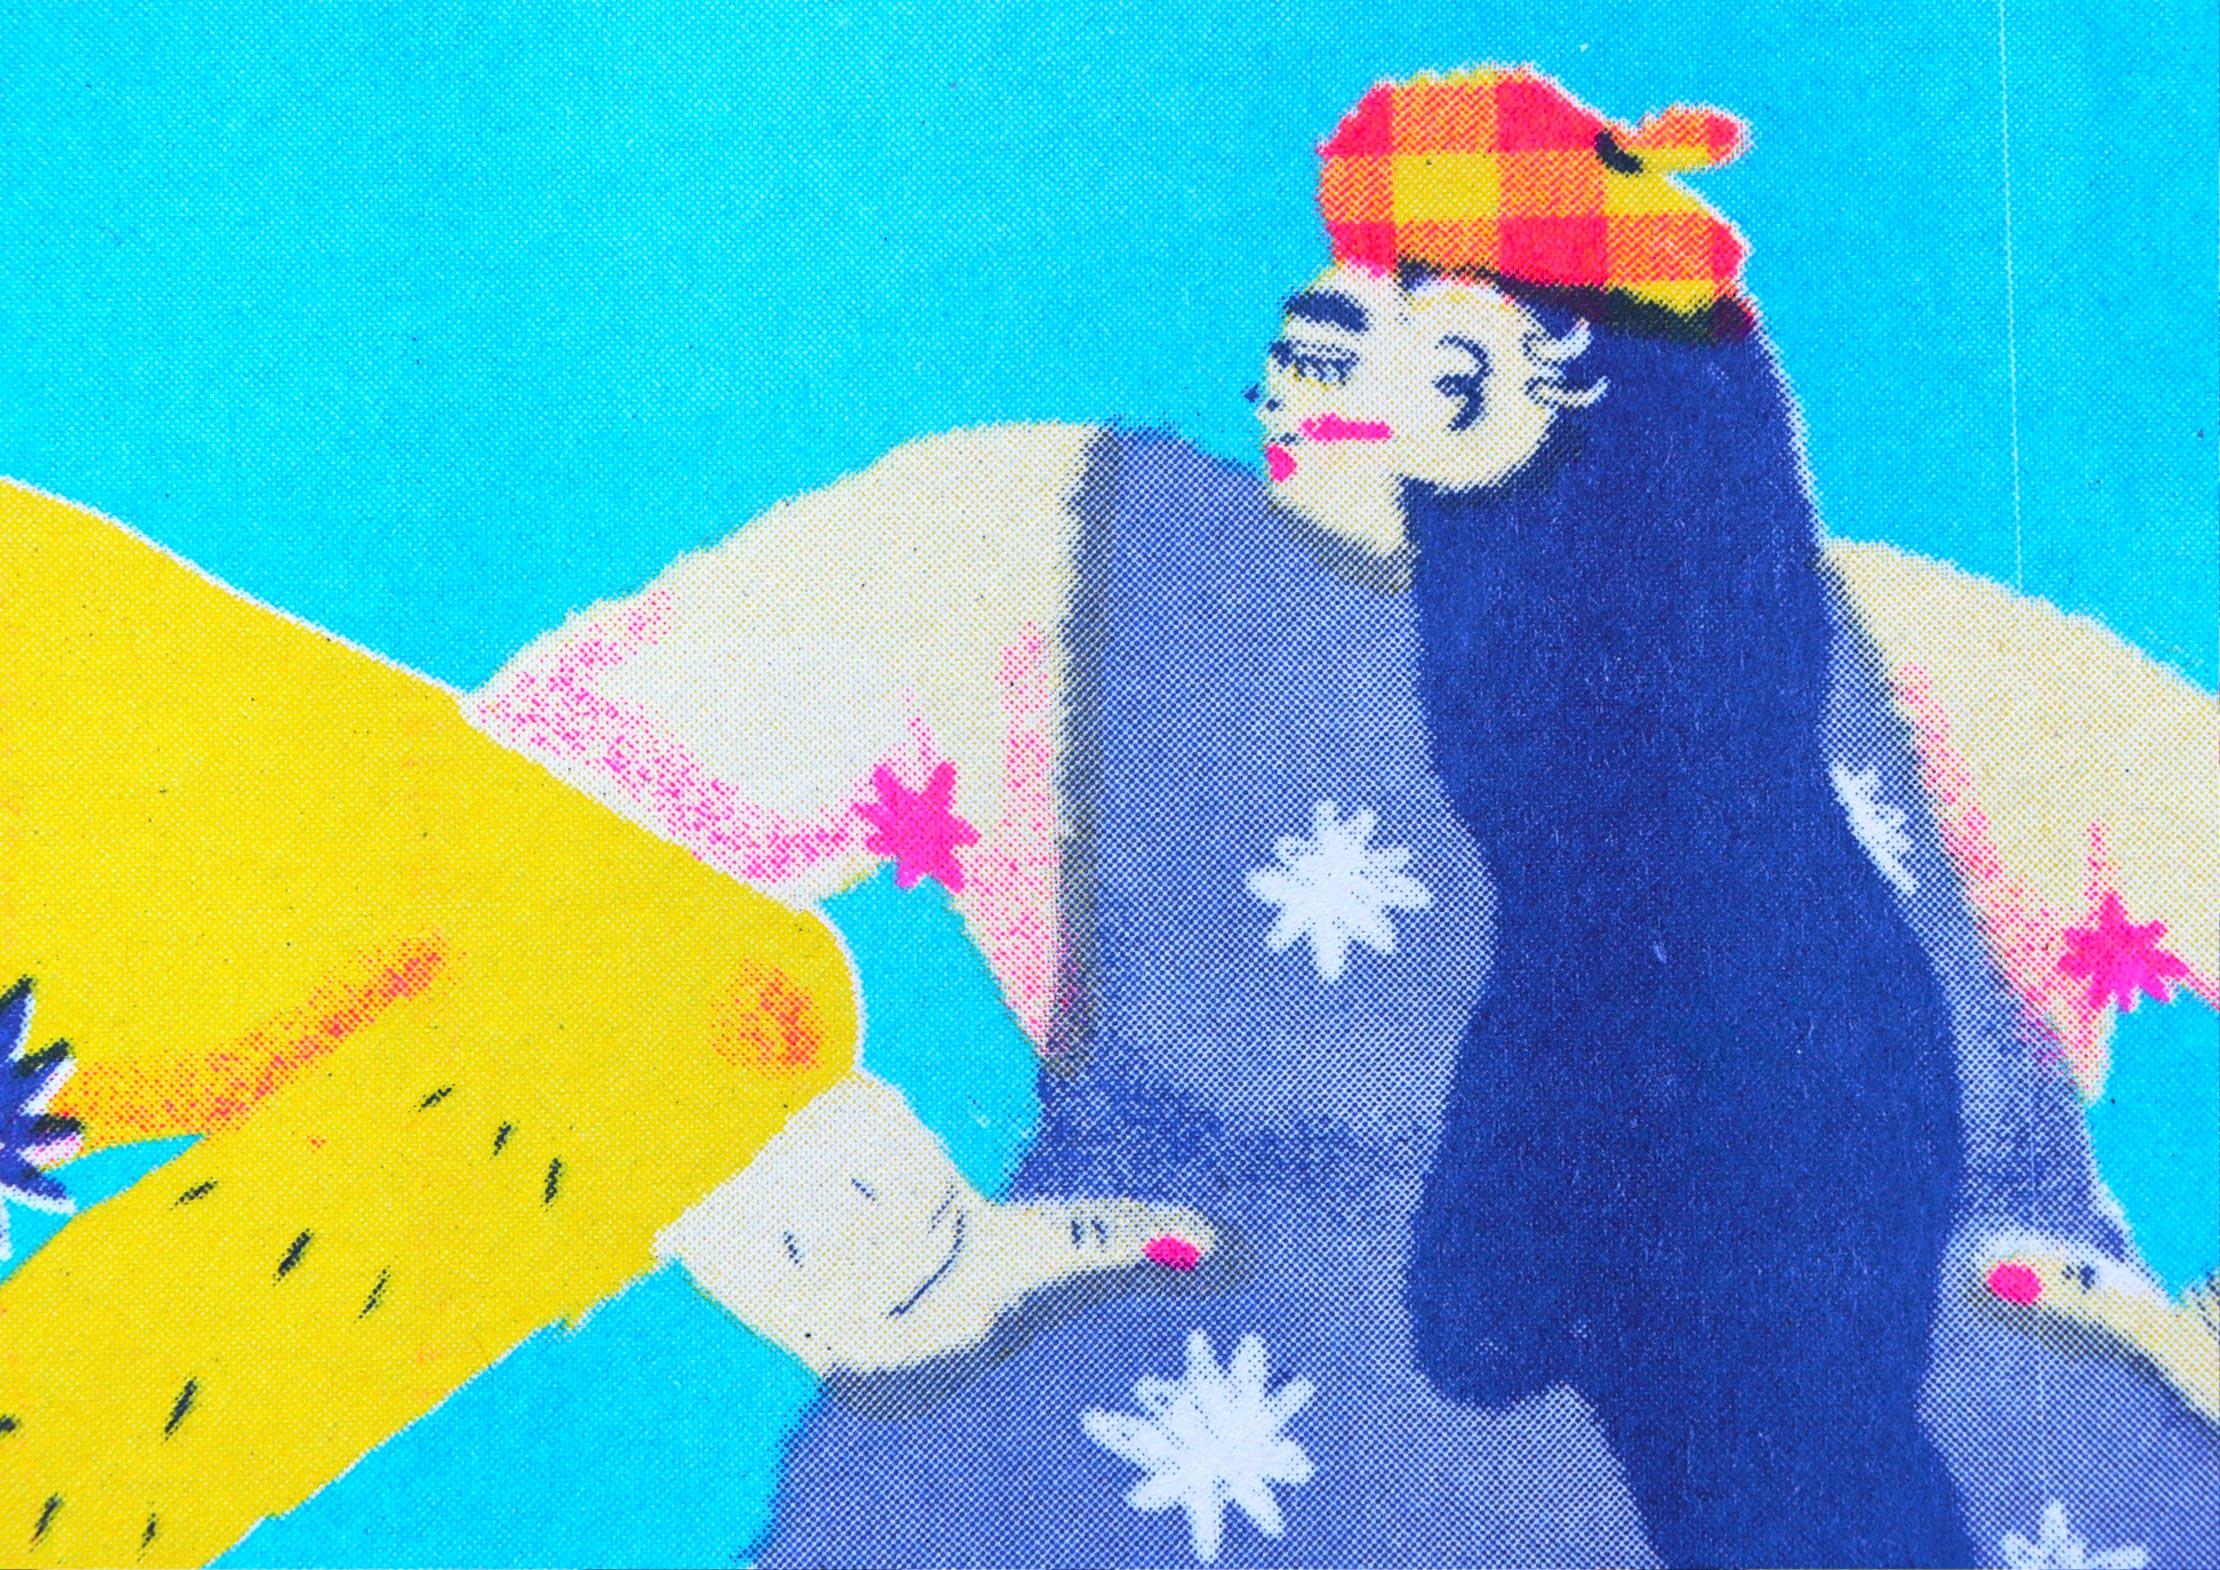 illustration of a punk in a tartan hat